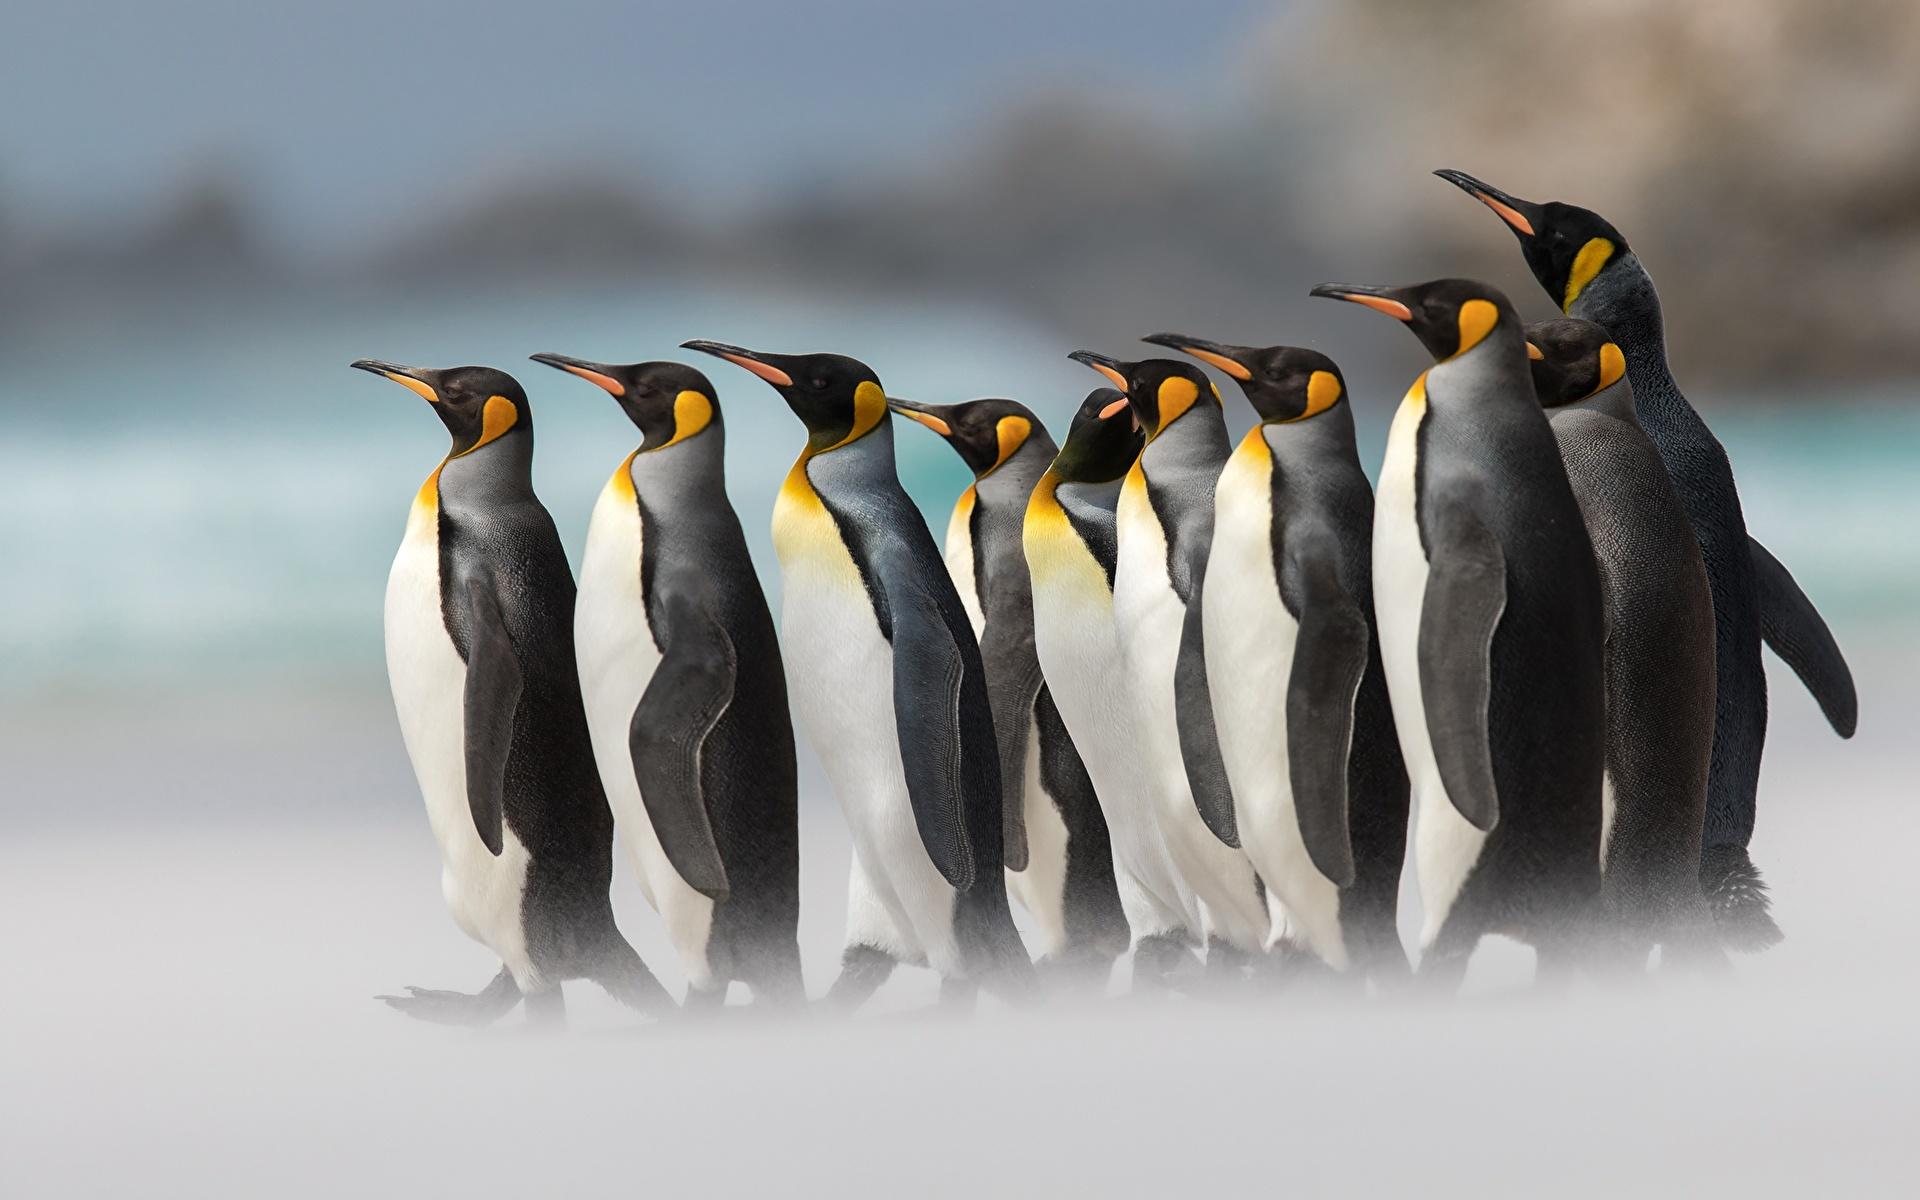 King Penguins wallpaper Gallery 1920x1200